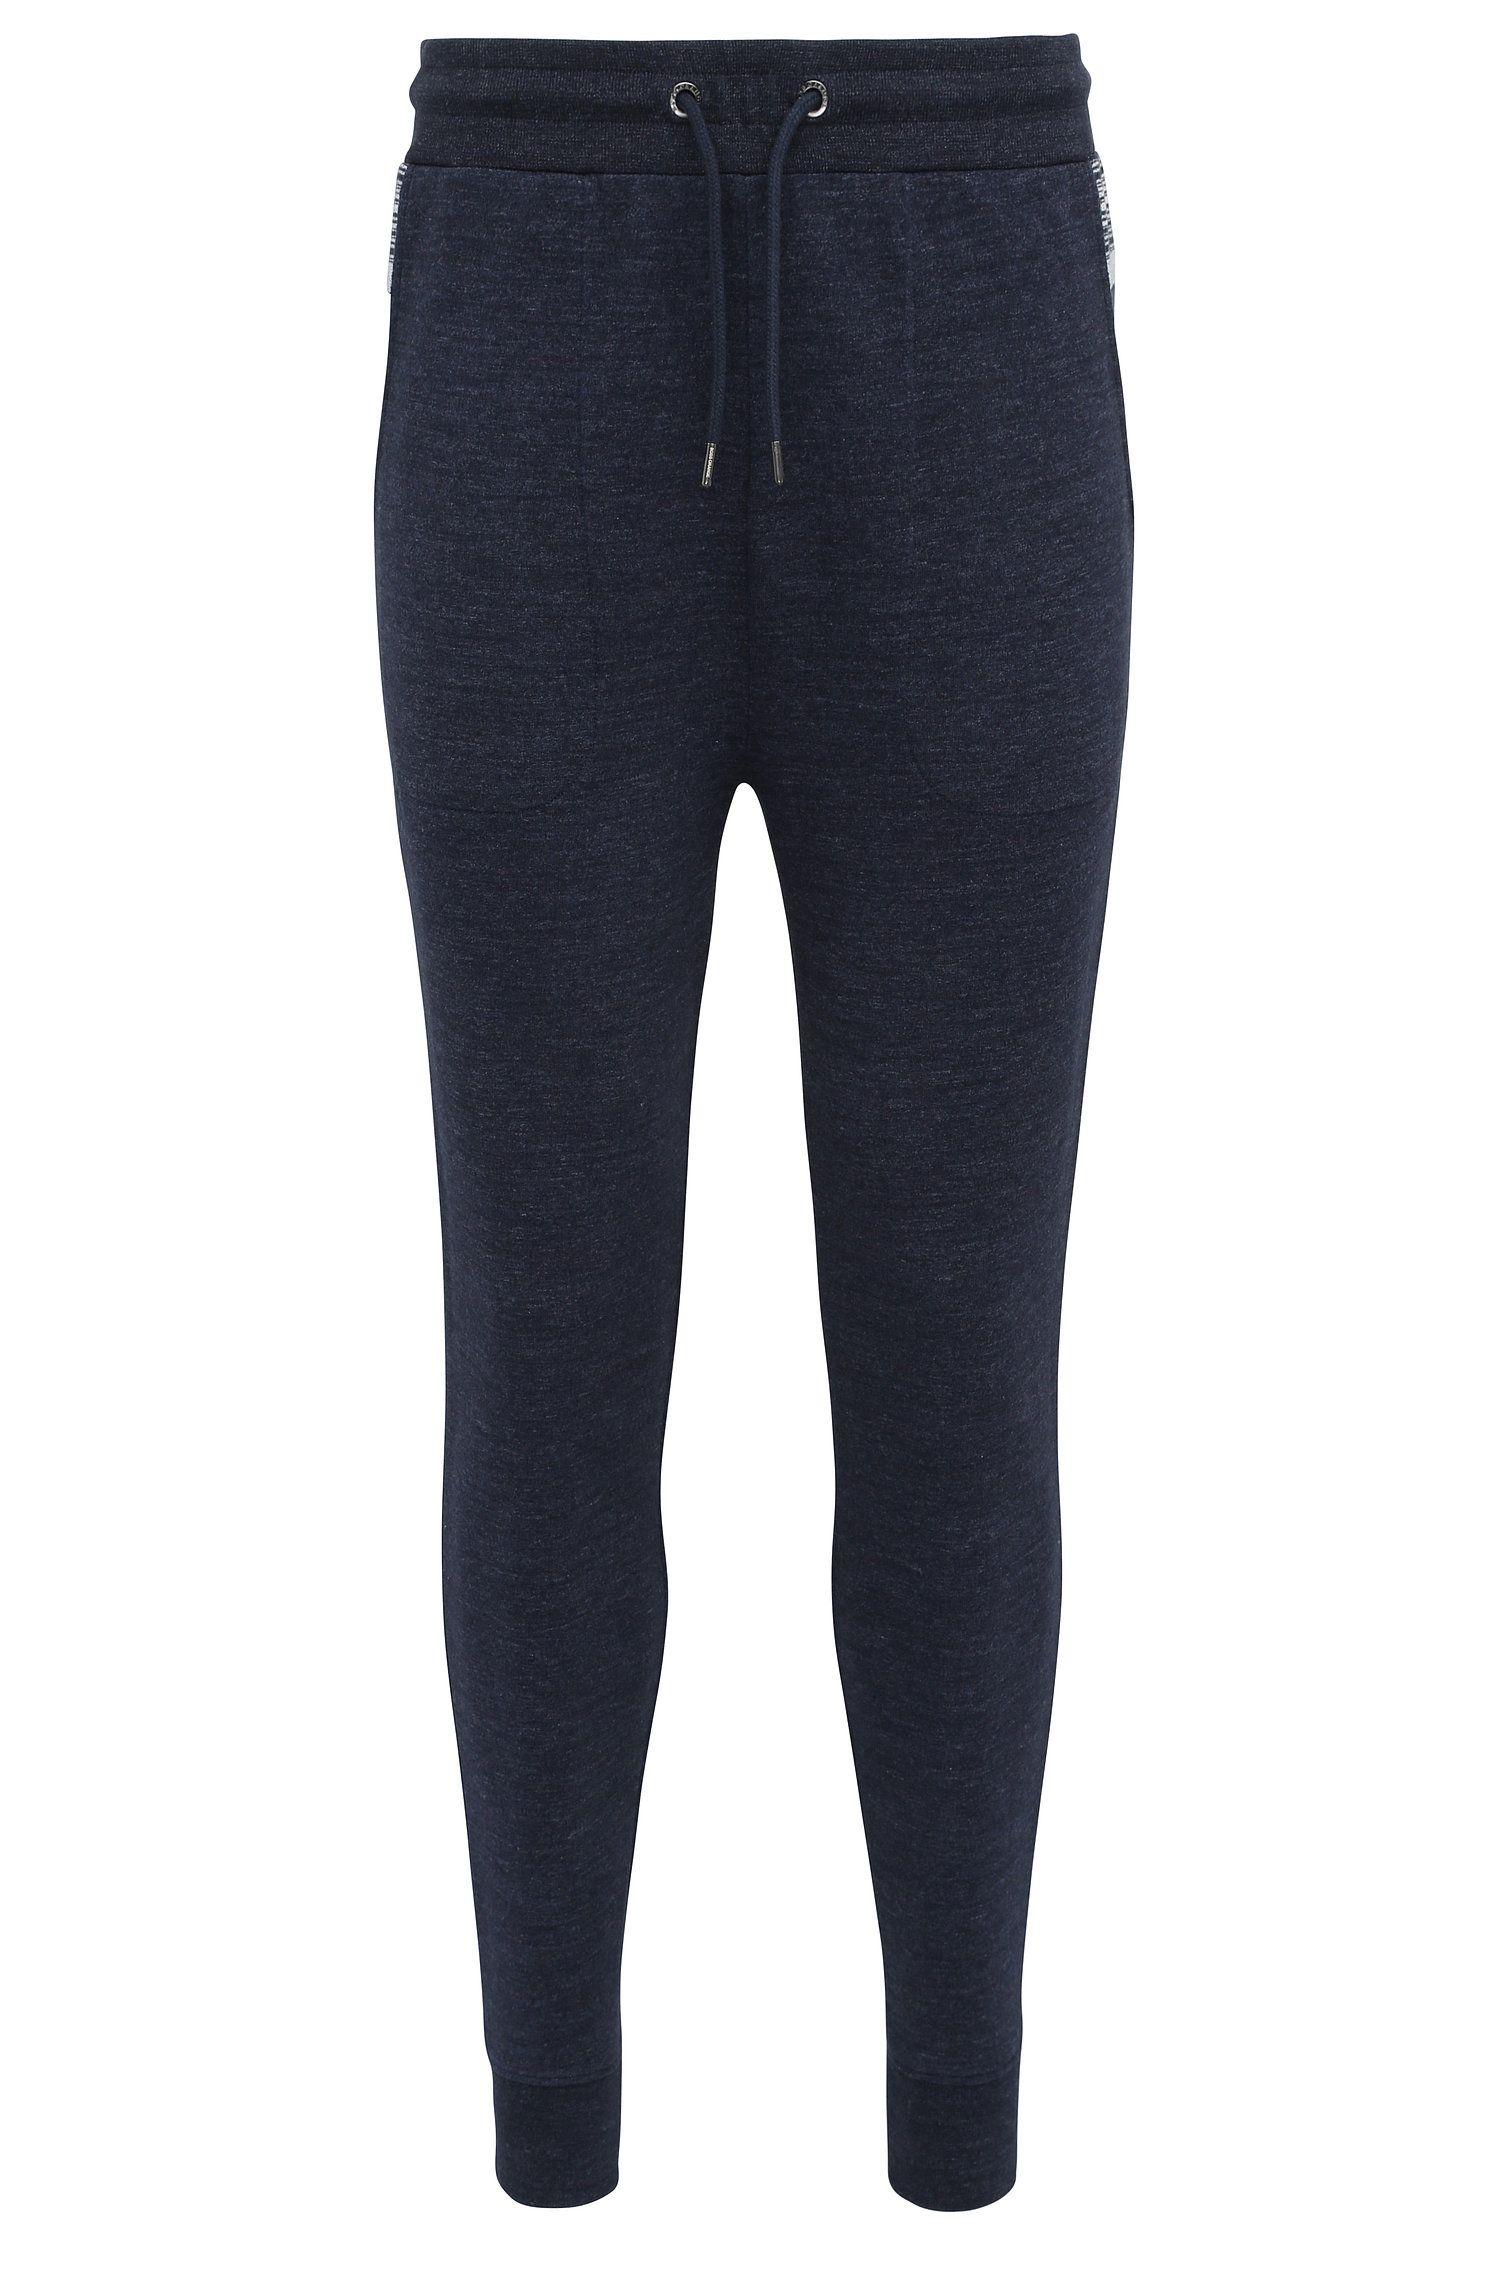 Pantalón de chándal regular fit en mezcla de algodón con elastano: 'Shines'